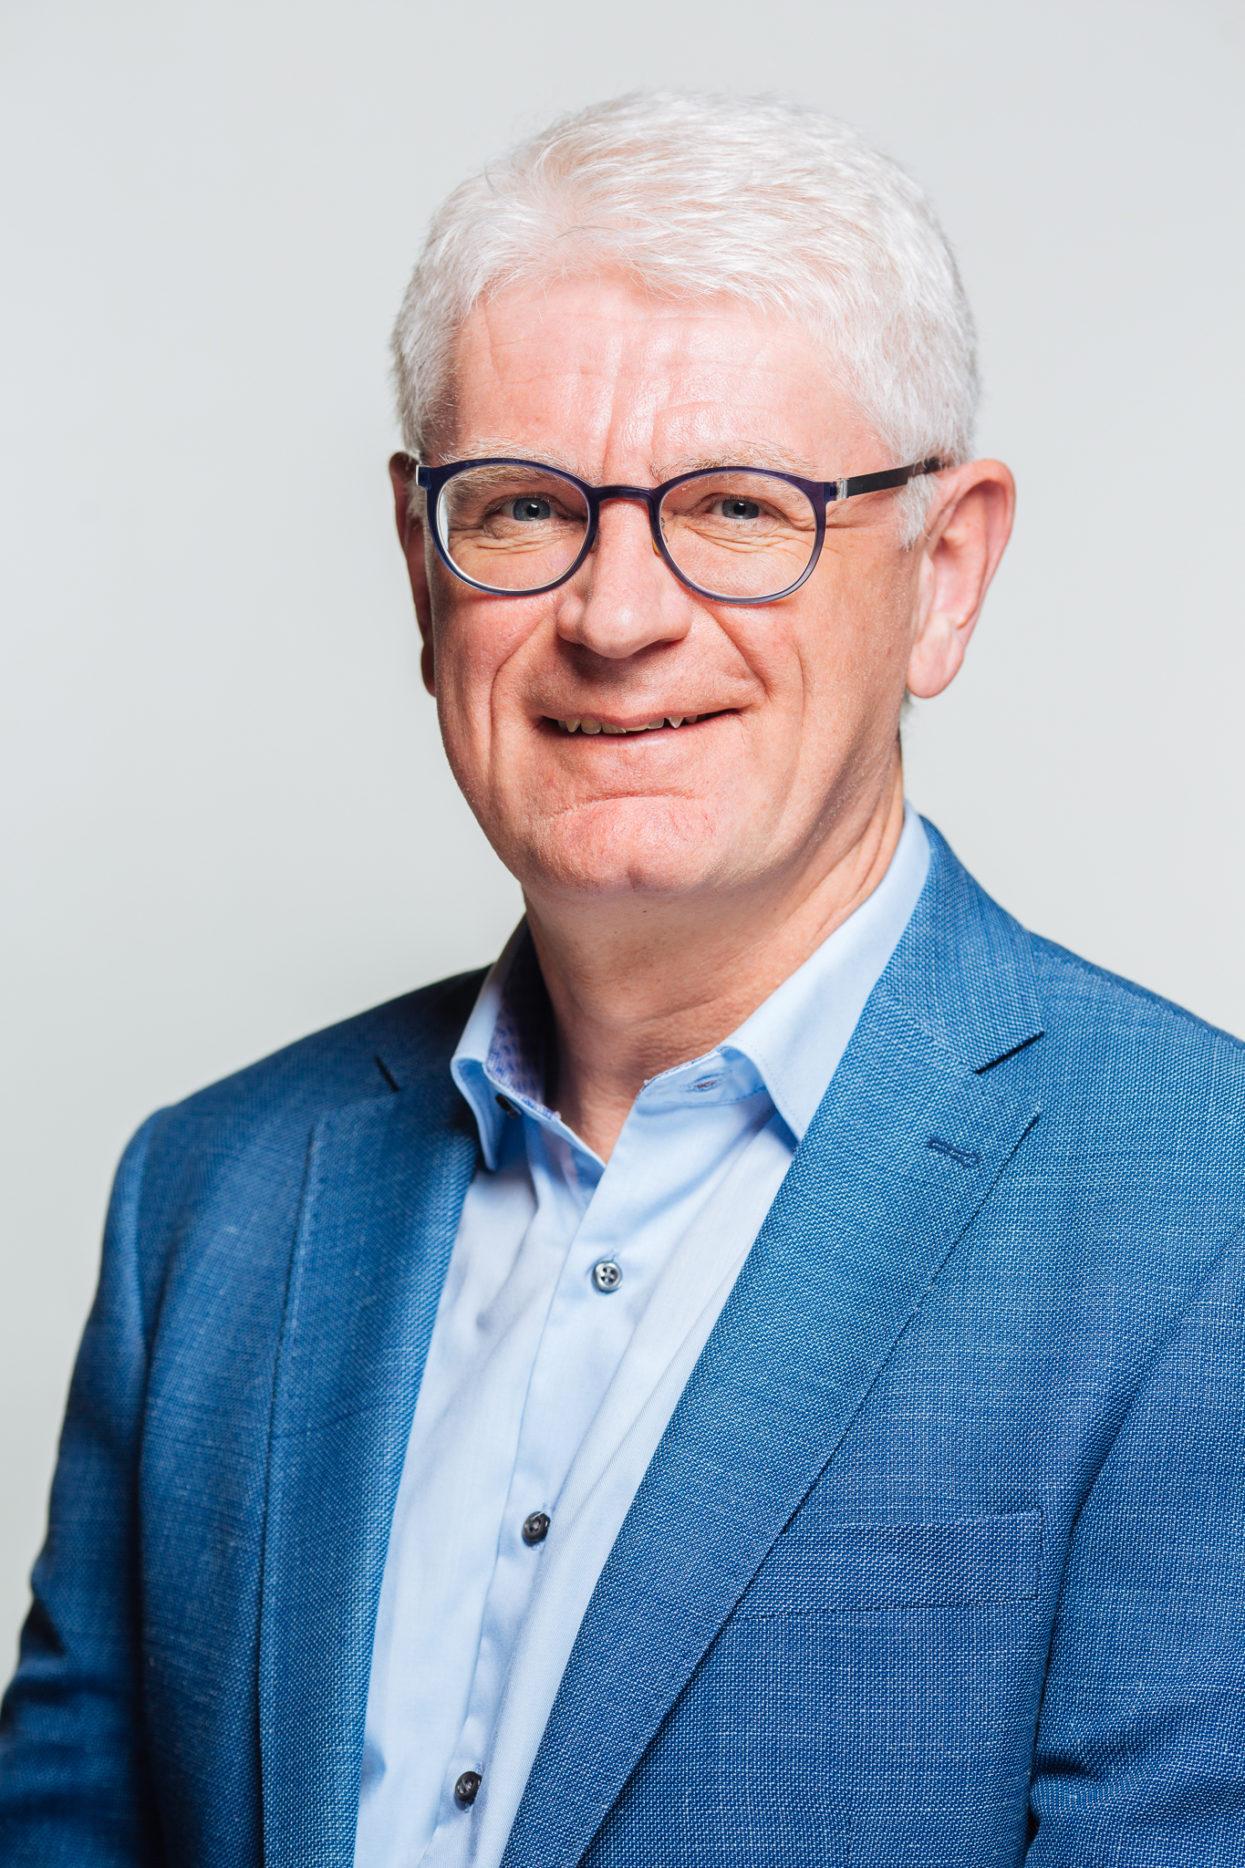 Claus Tolstrup Nielsen